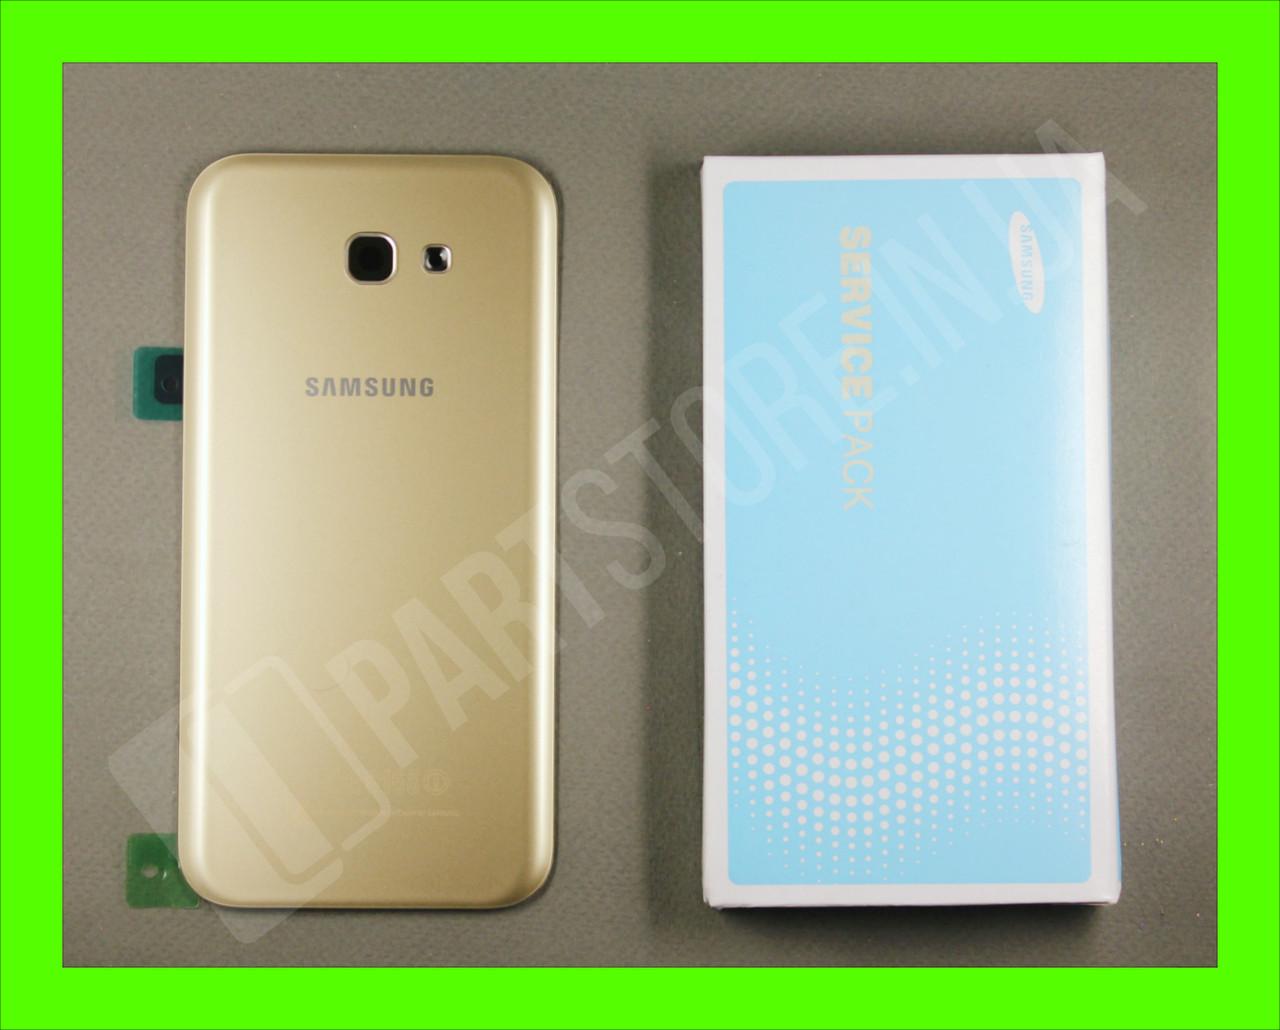 Cервисная оригинальная задняя Крышка Samsung A720 Gold A7 2017 (GH82-13679B)